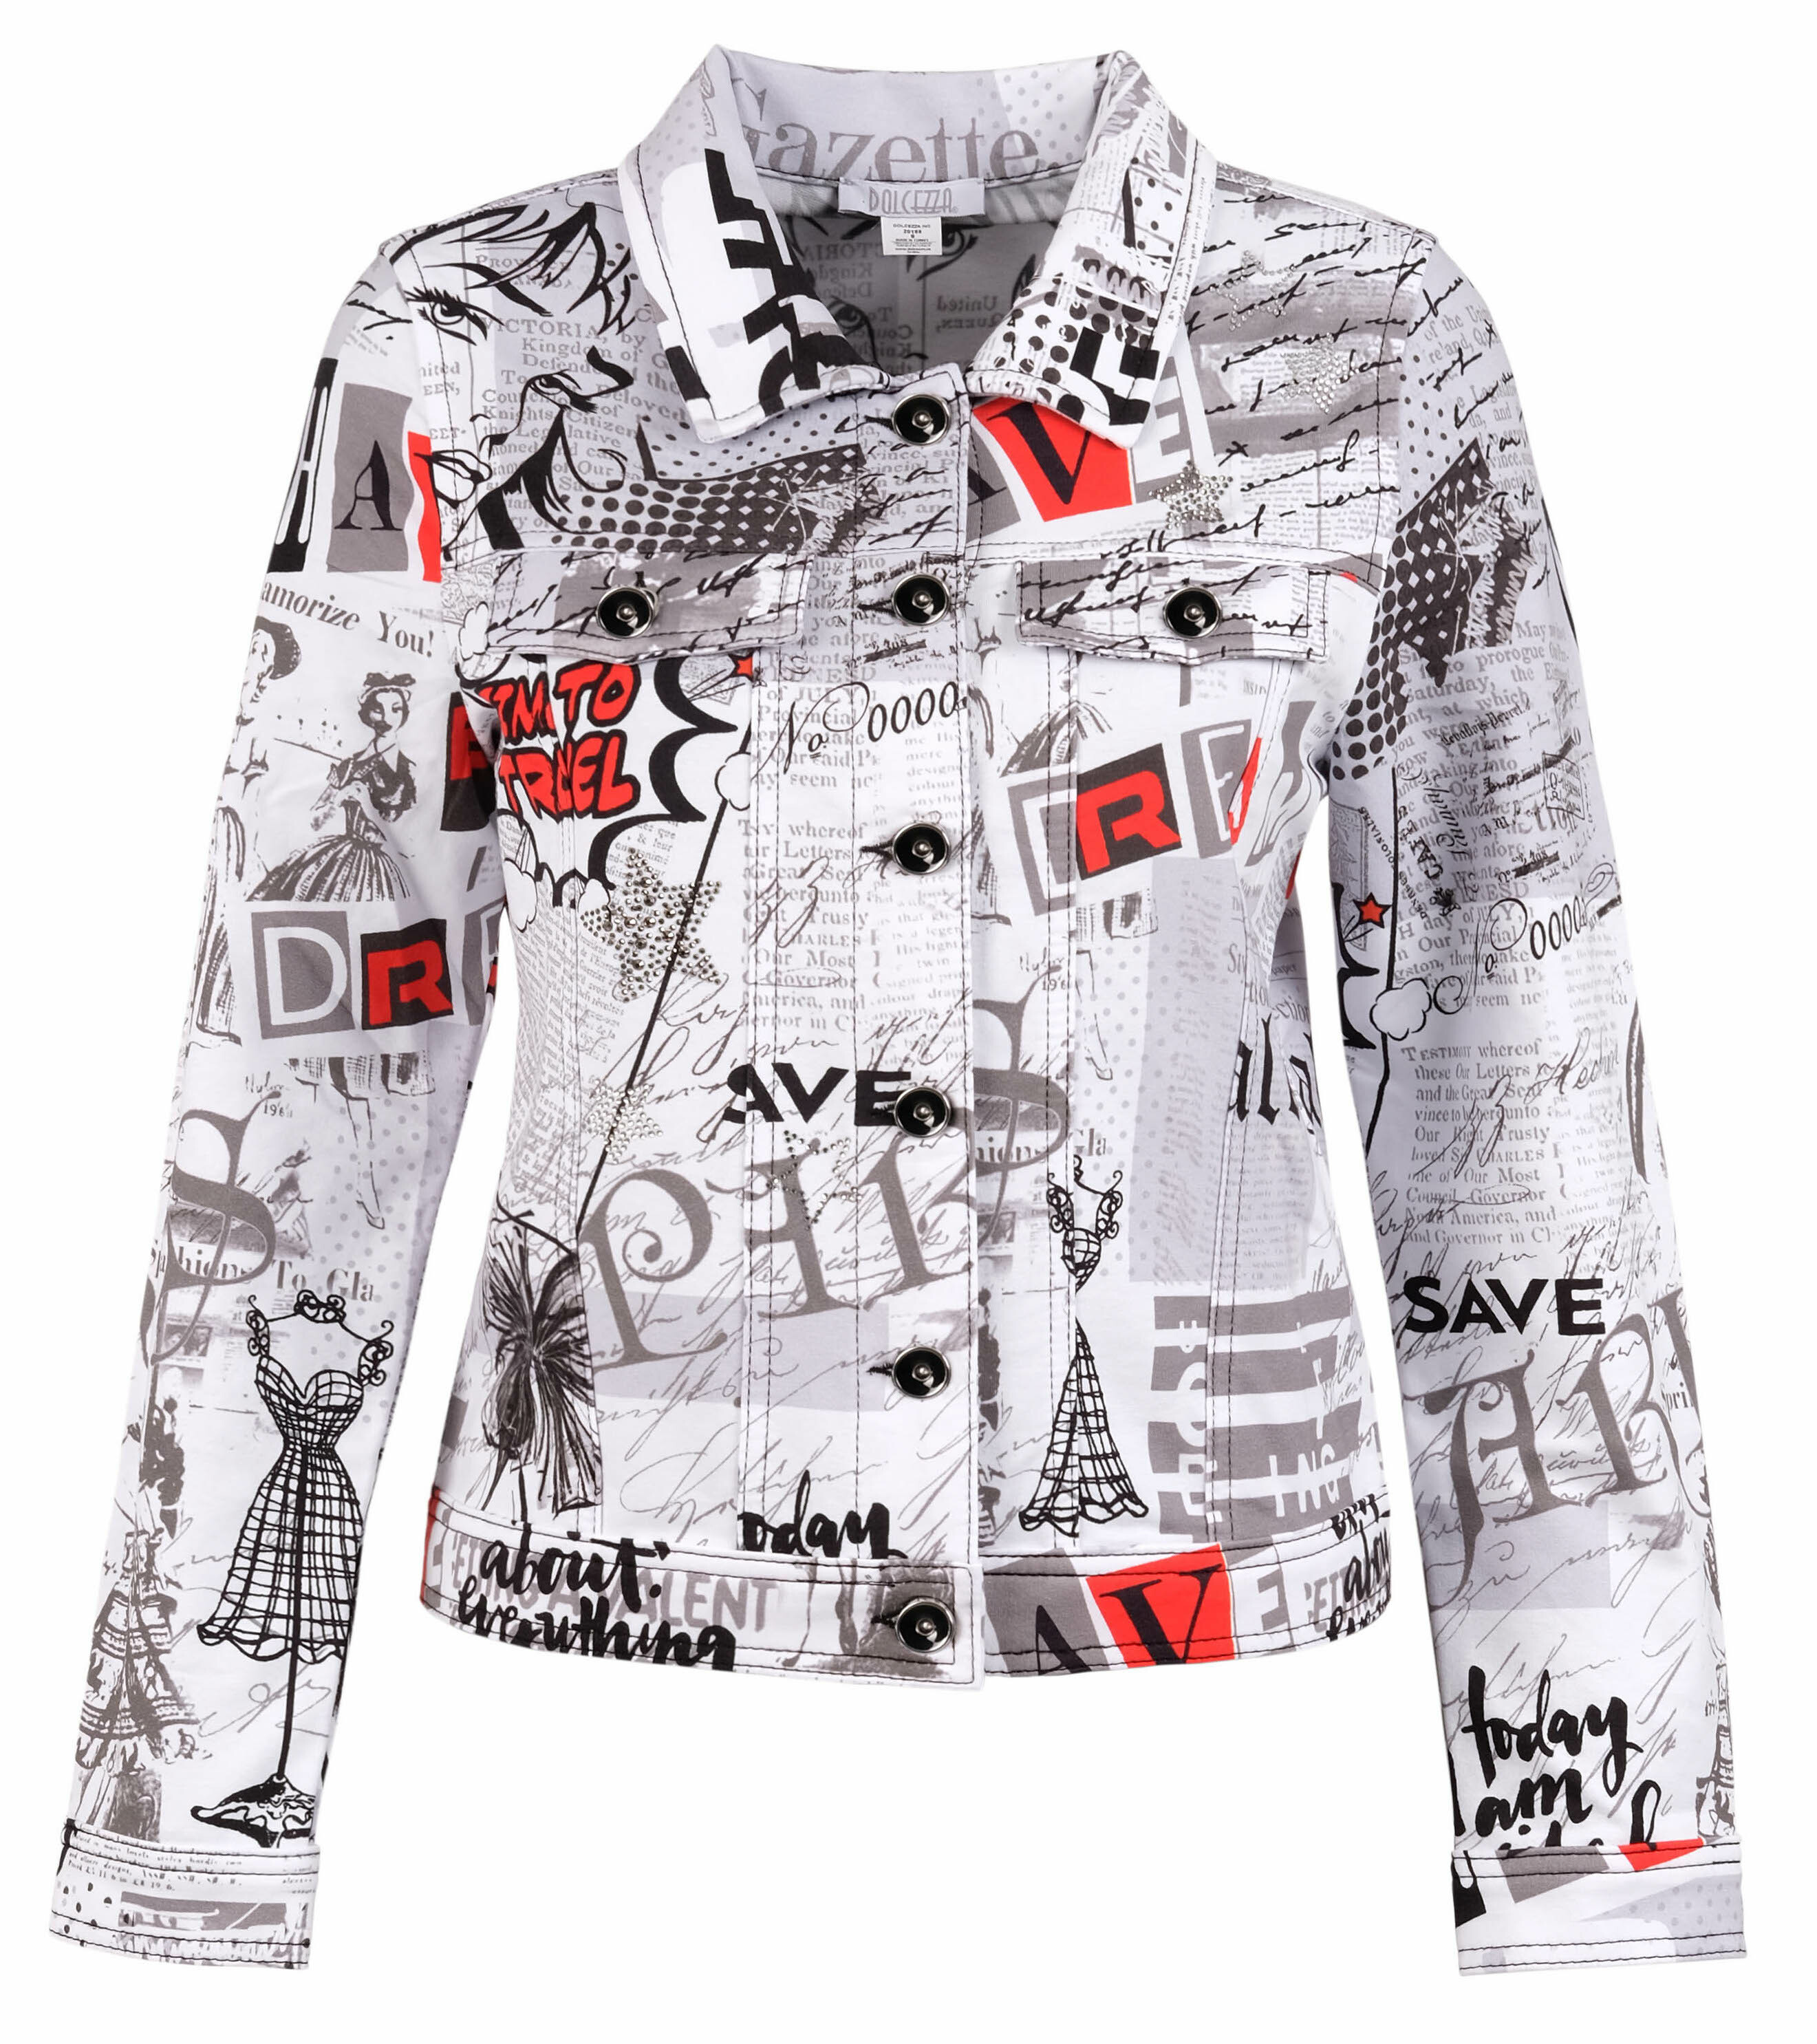 Dolcezza: Vintage Newspaper Boudoir Soft Denim Jacket (More Arrived!) DOLCEZZA_20168_N1